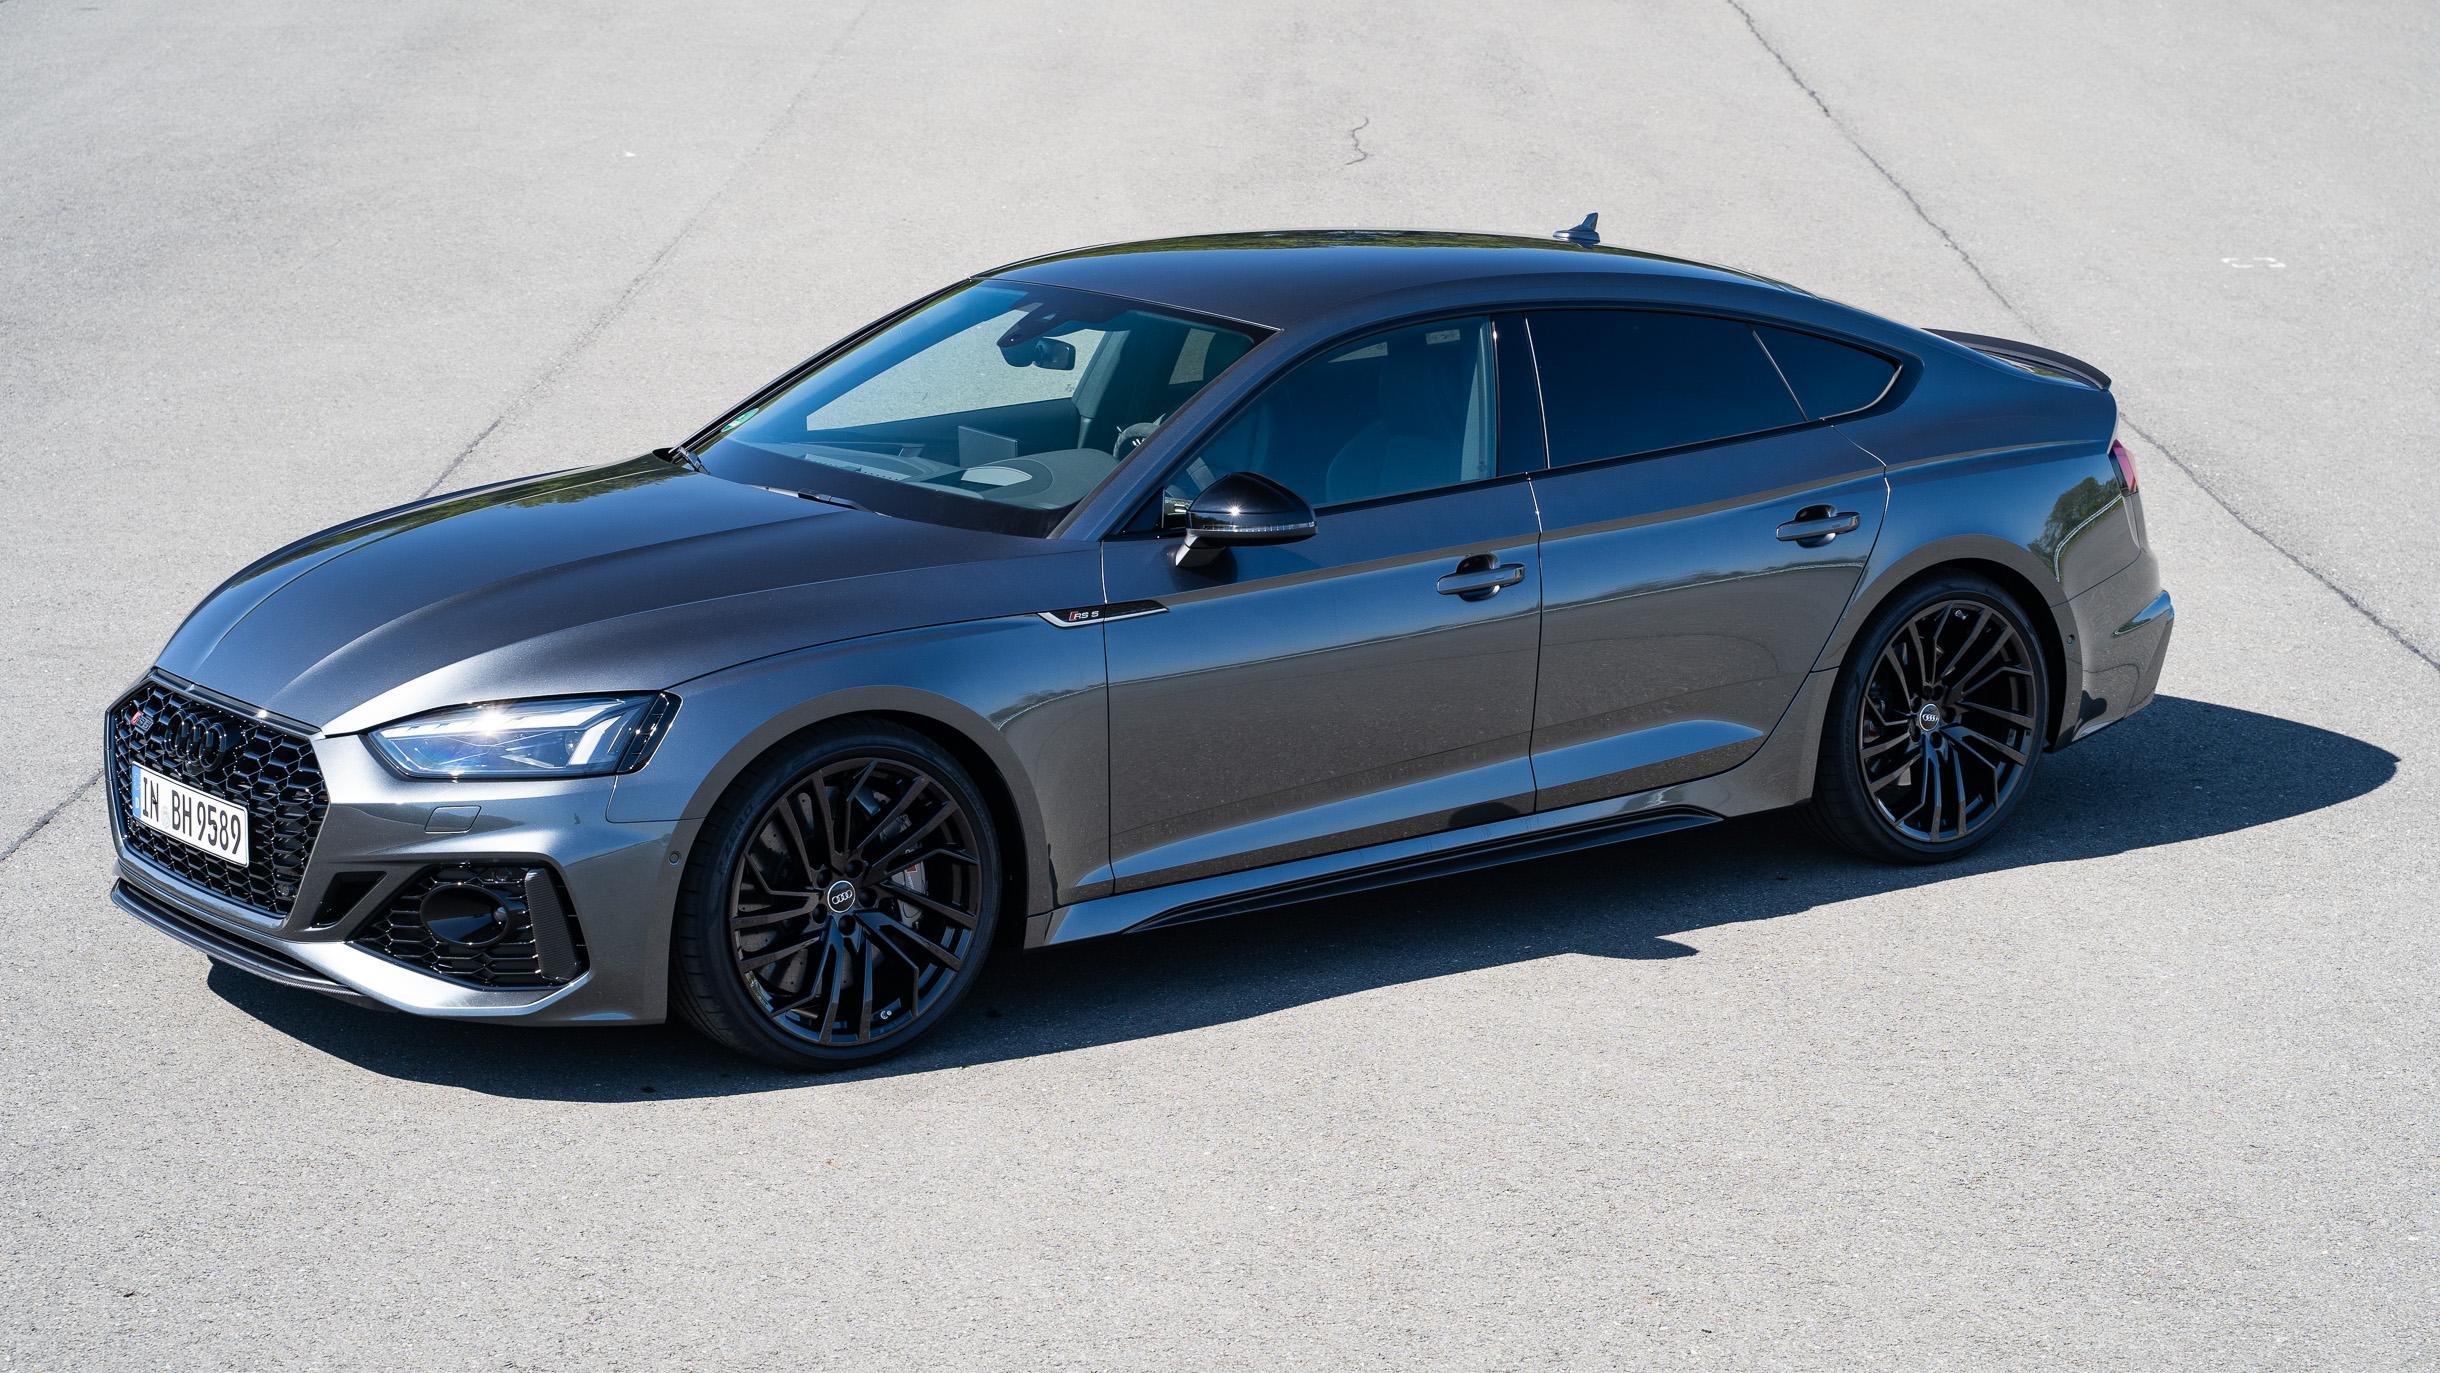 2020 Audi S5 Speed Test